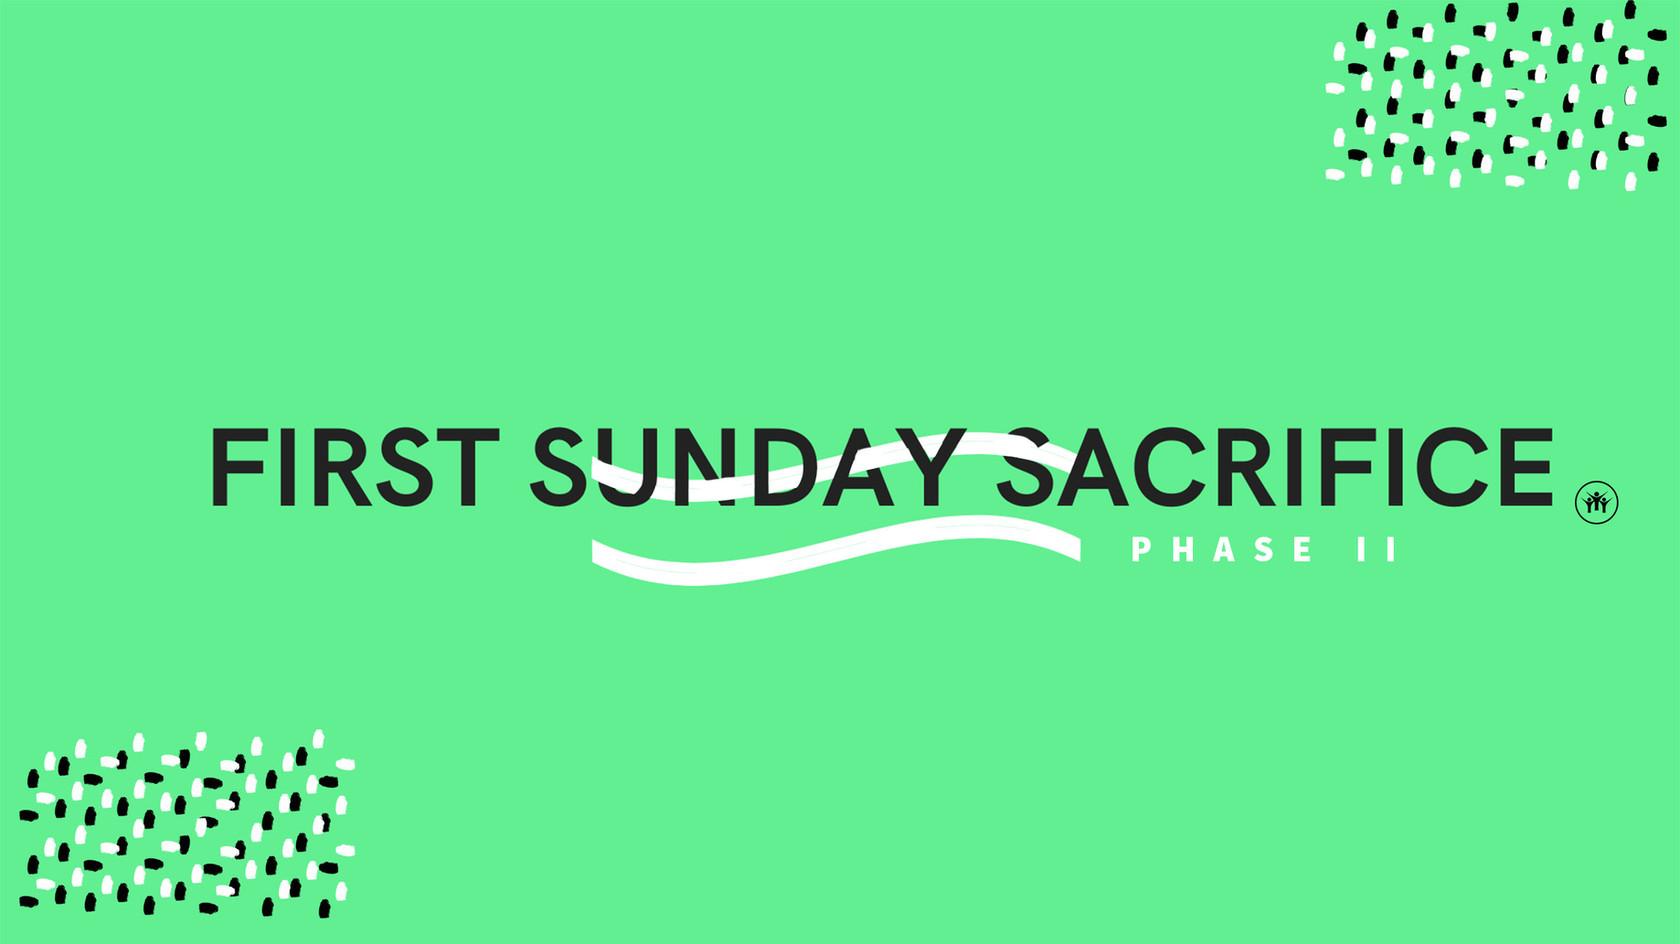 first Sunday Sacrifice phase ii.jpg